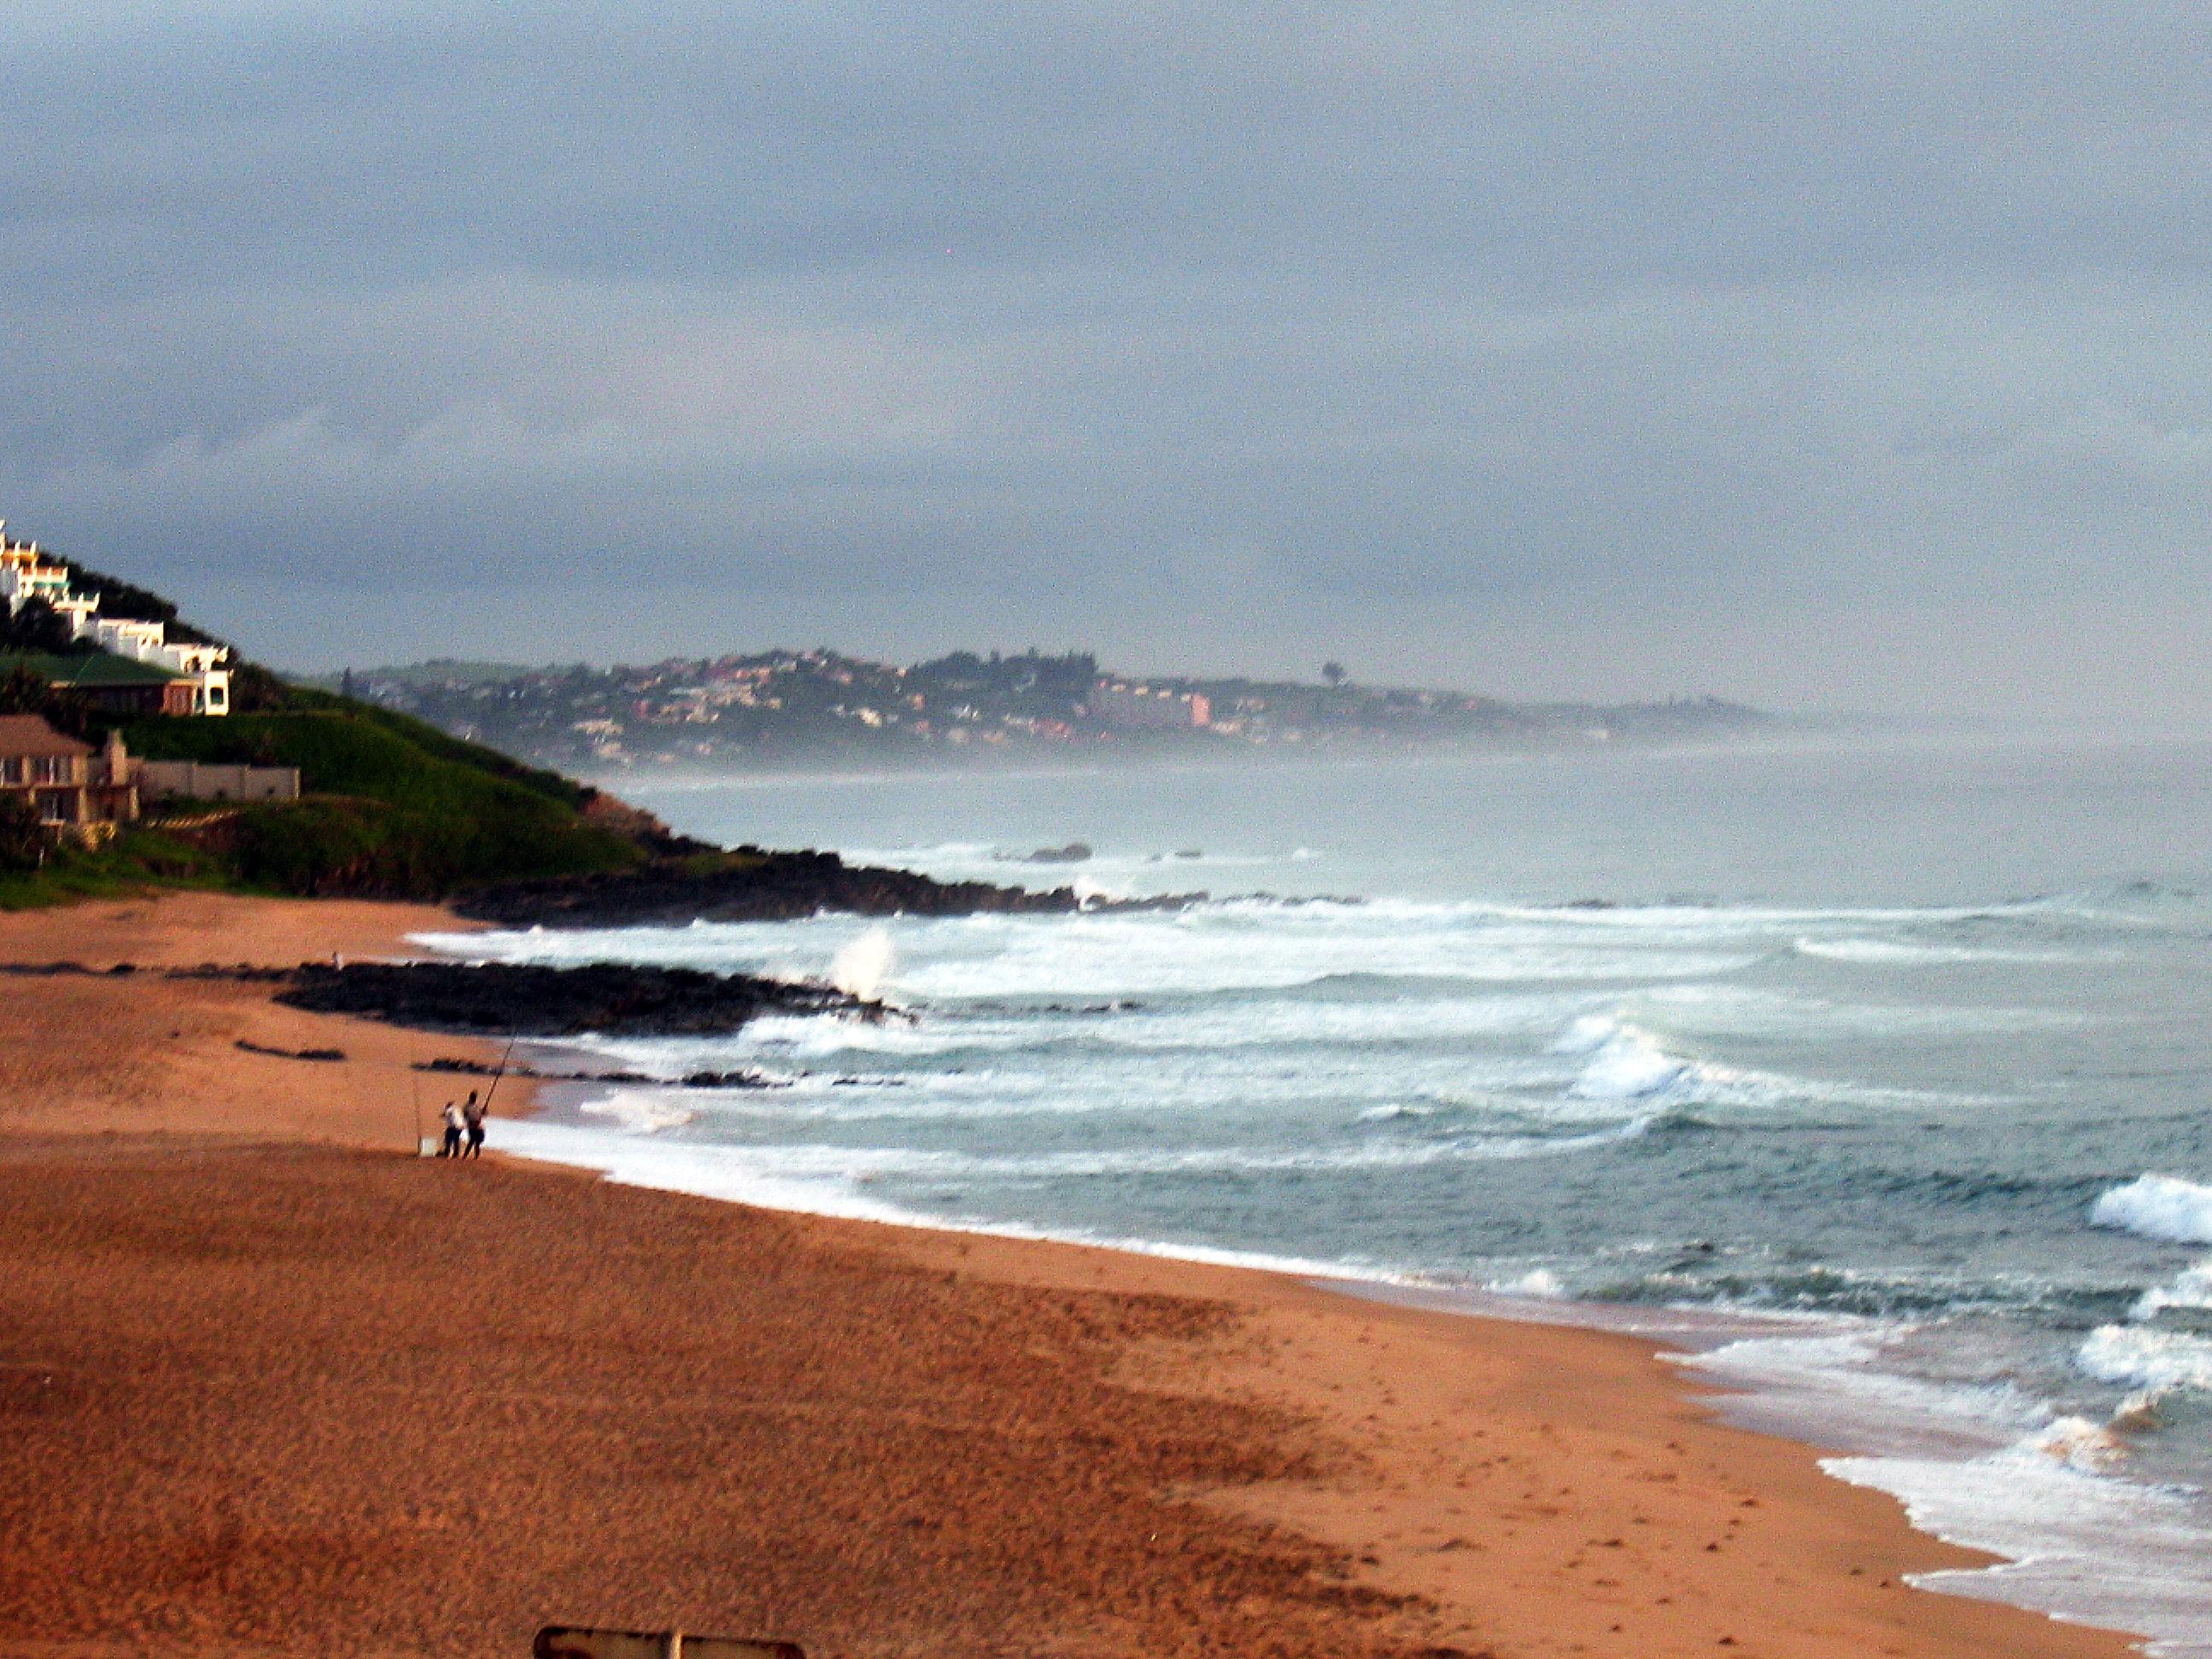 South Africa Beach Video